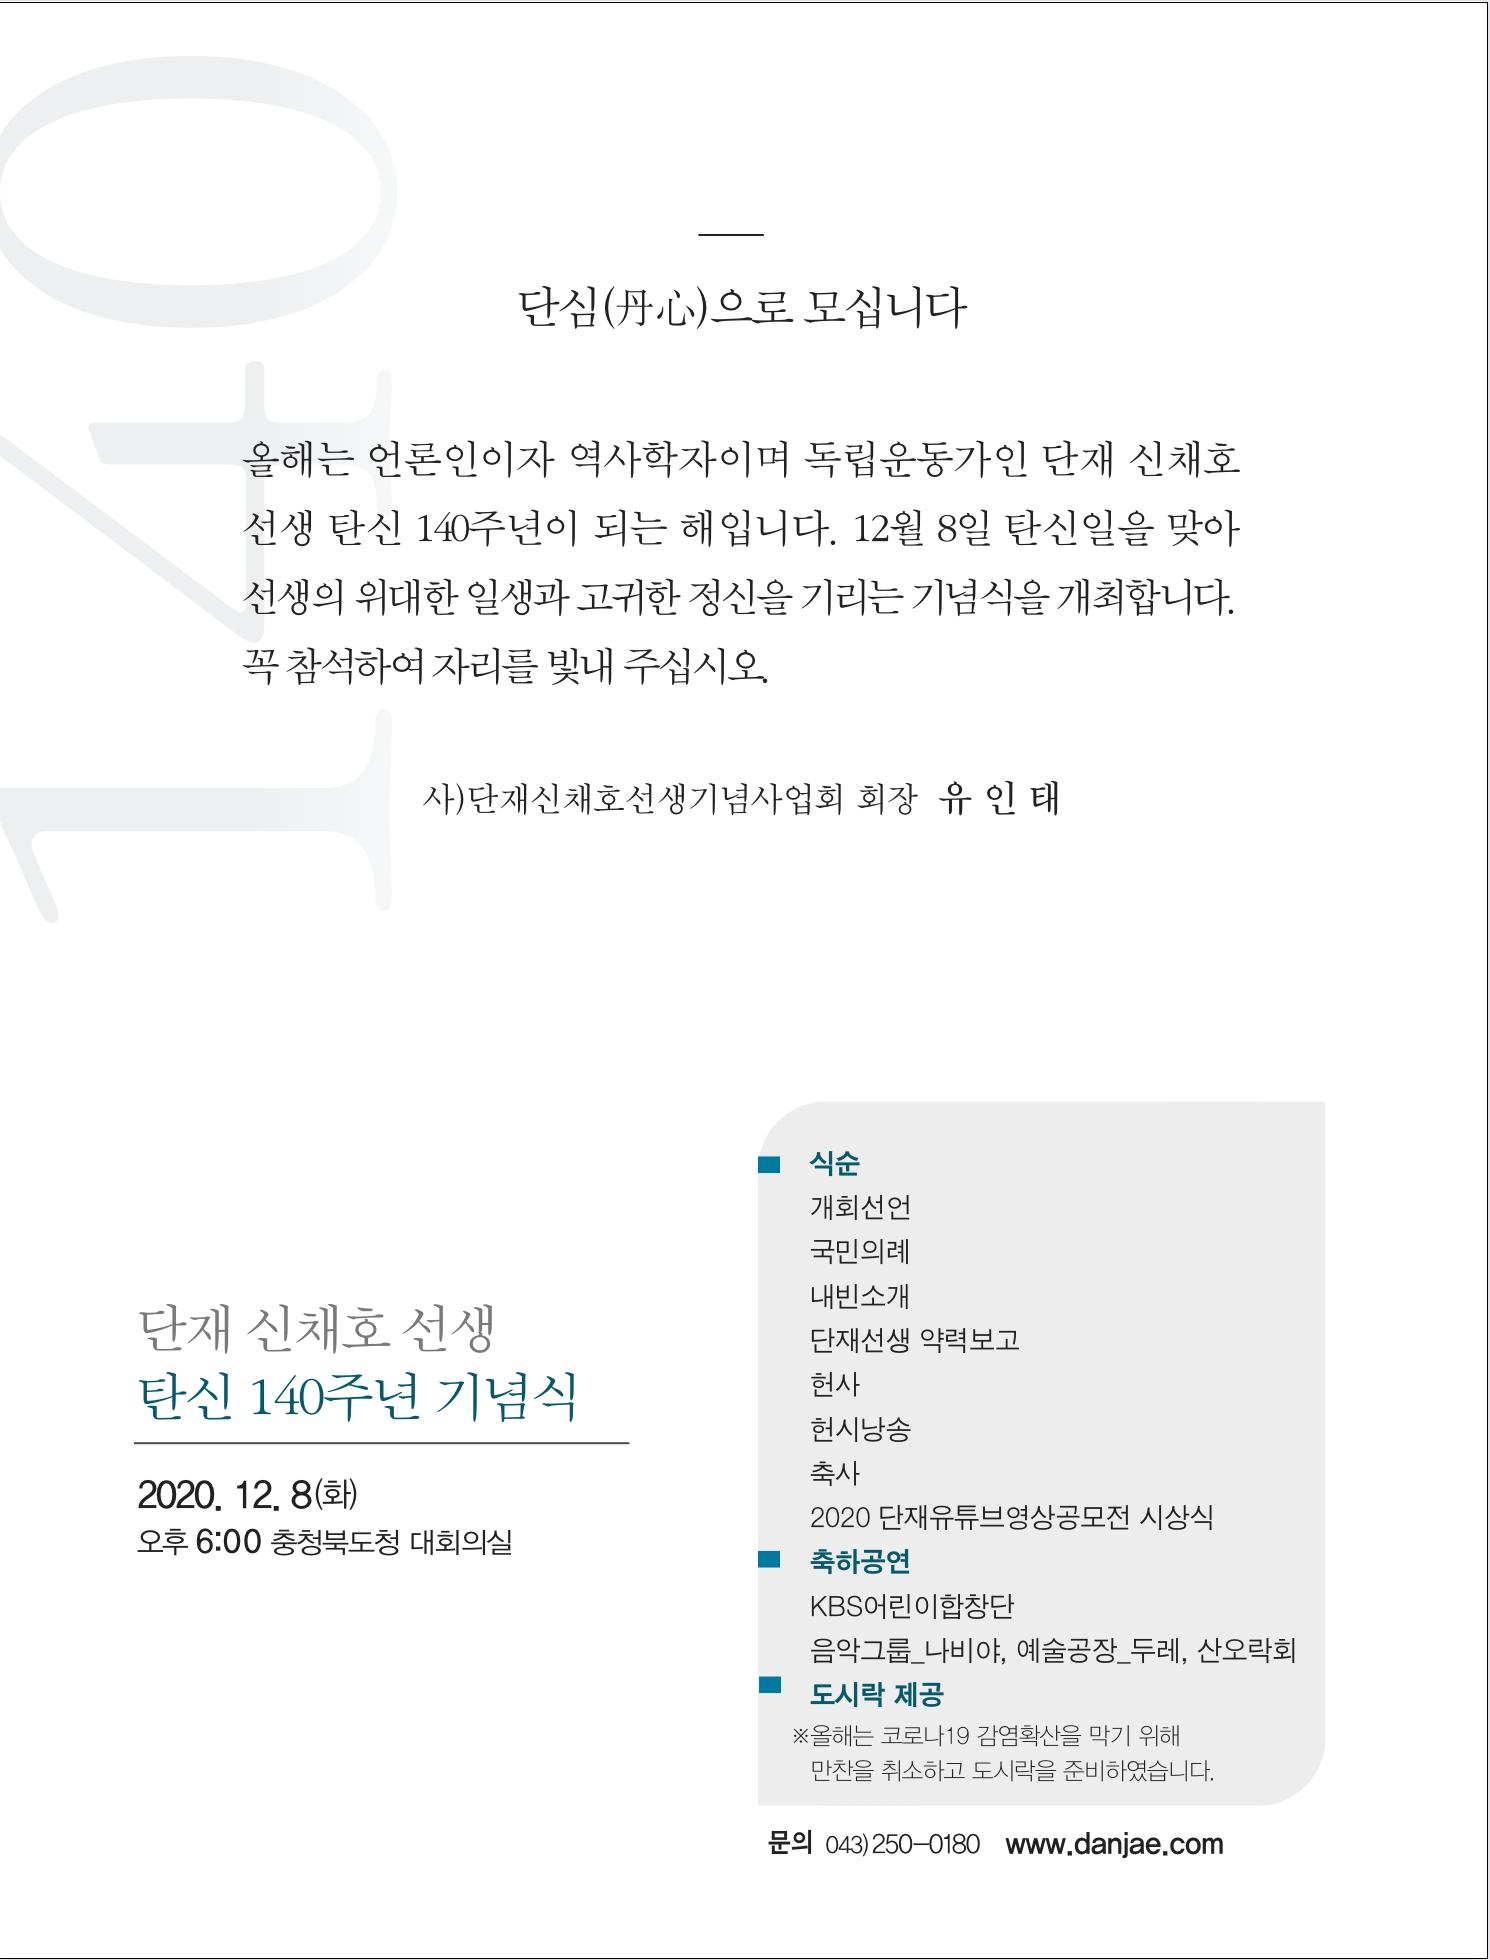 KakaoTalk_20201111_101347180.png